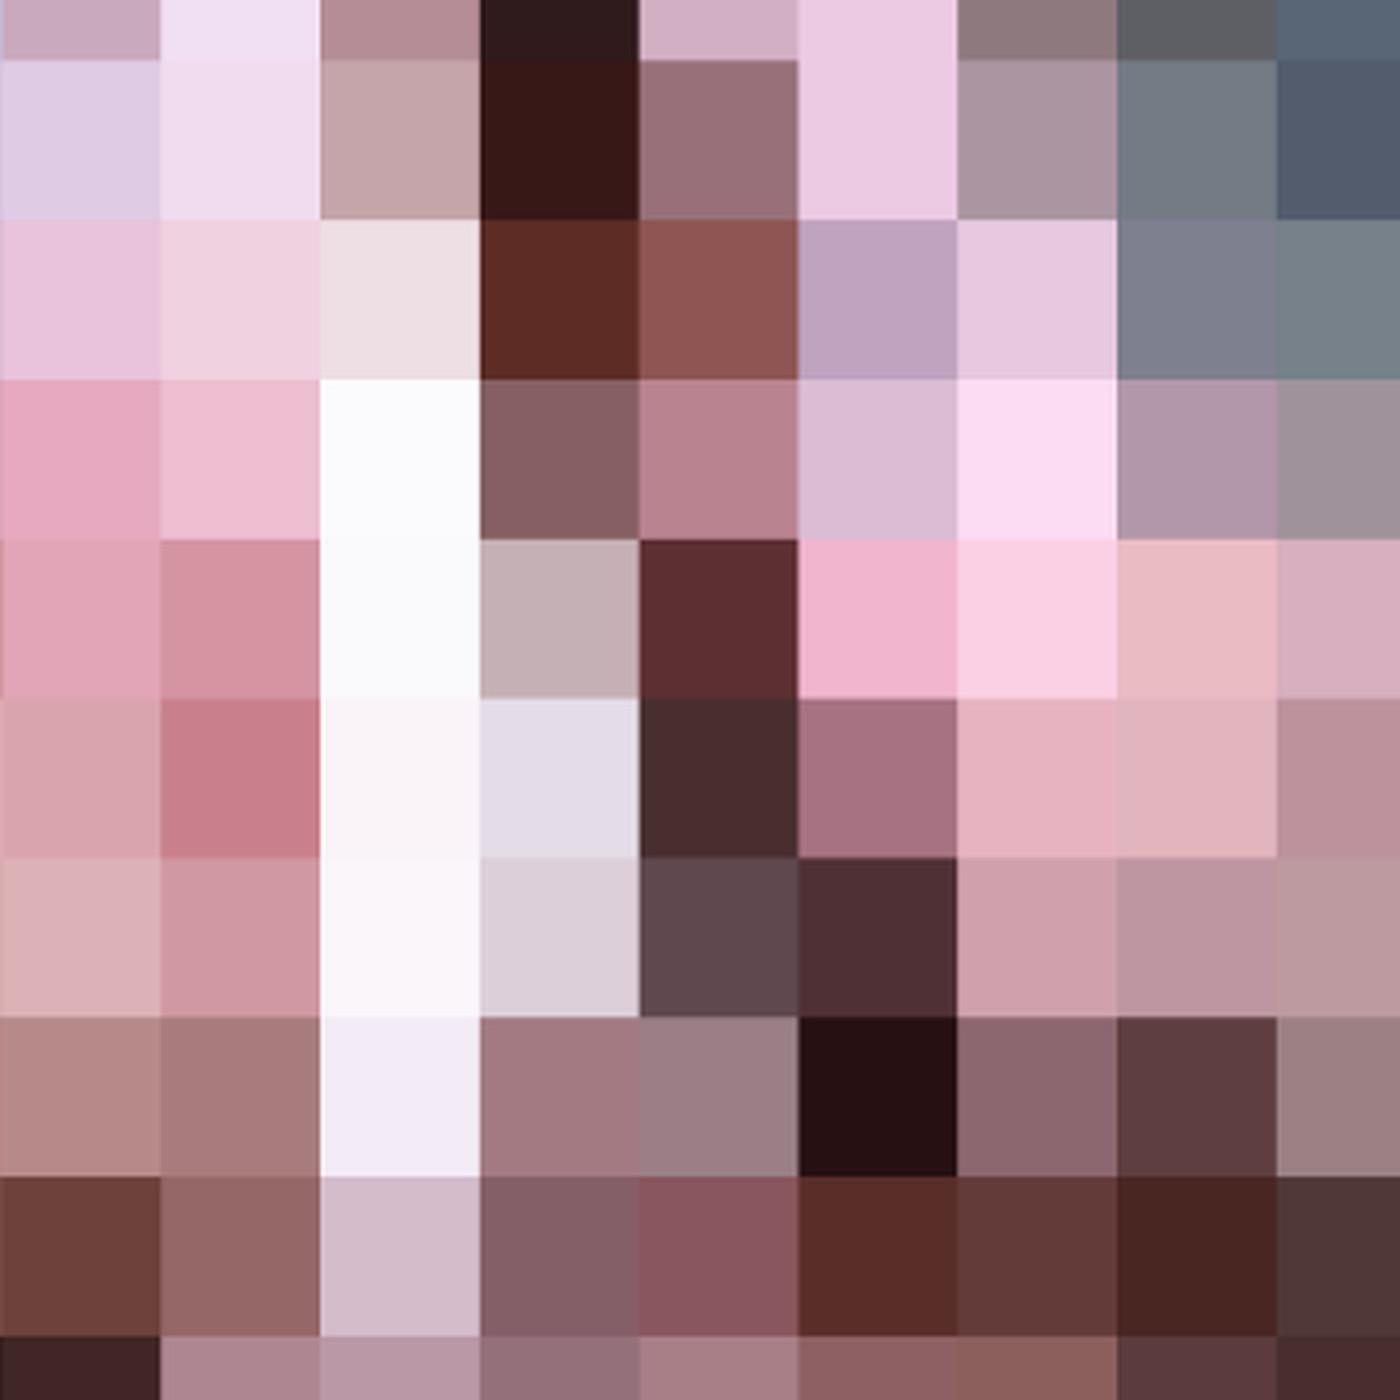 Janine lindemuller interracial